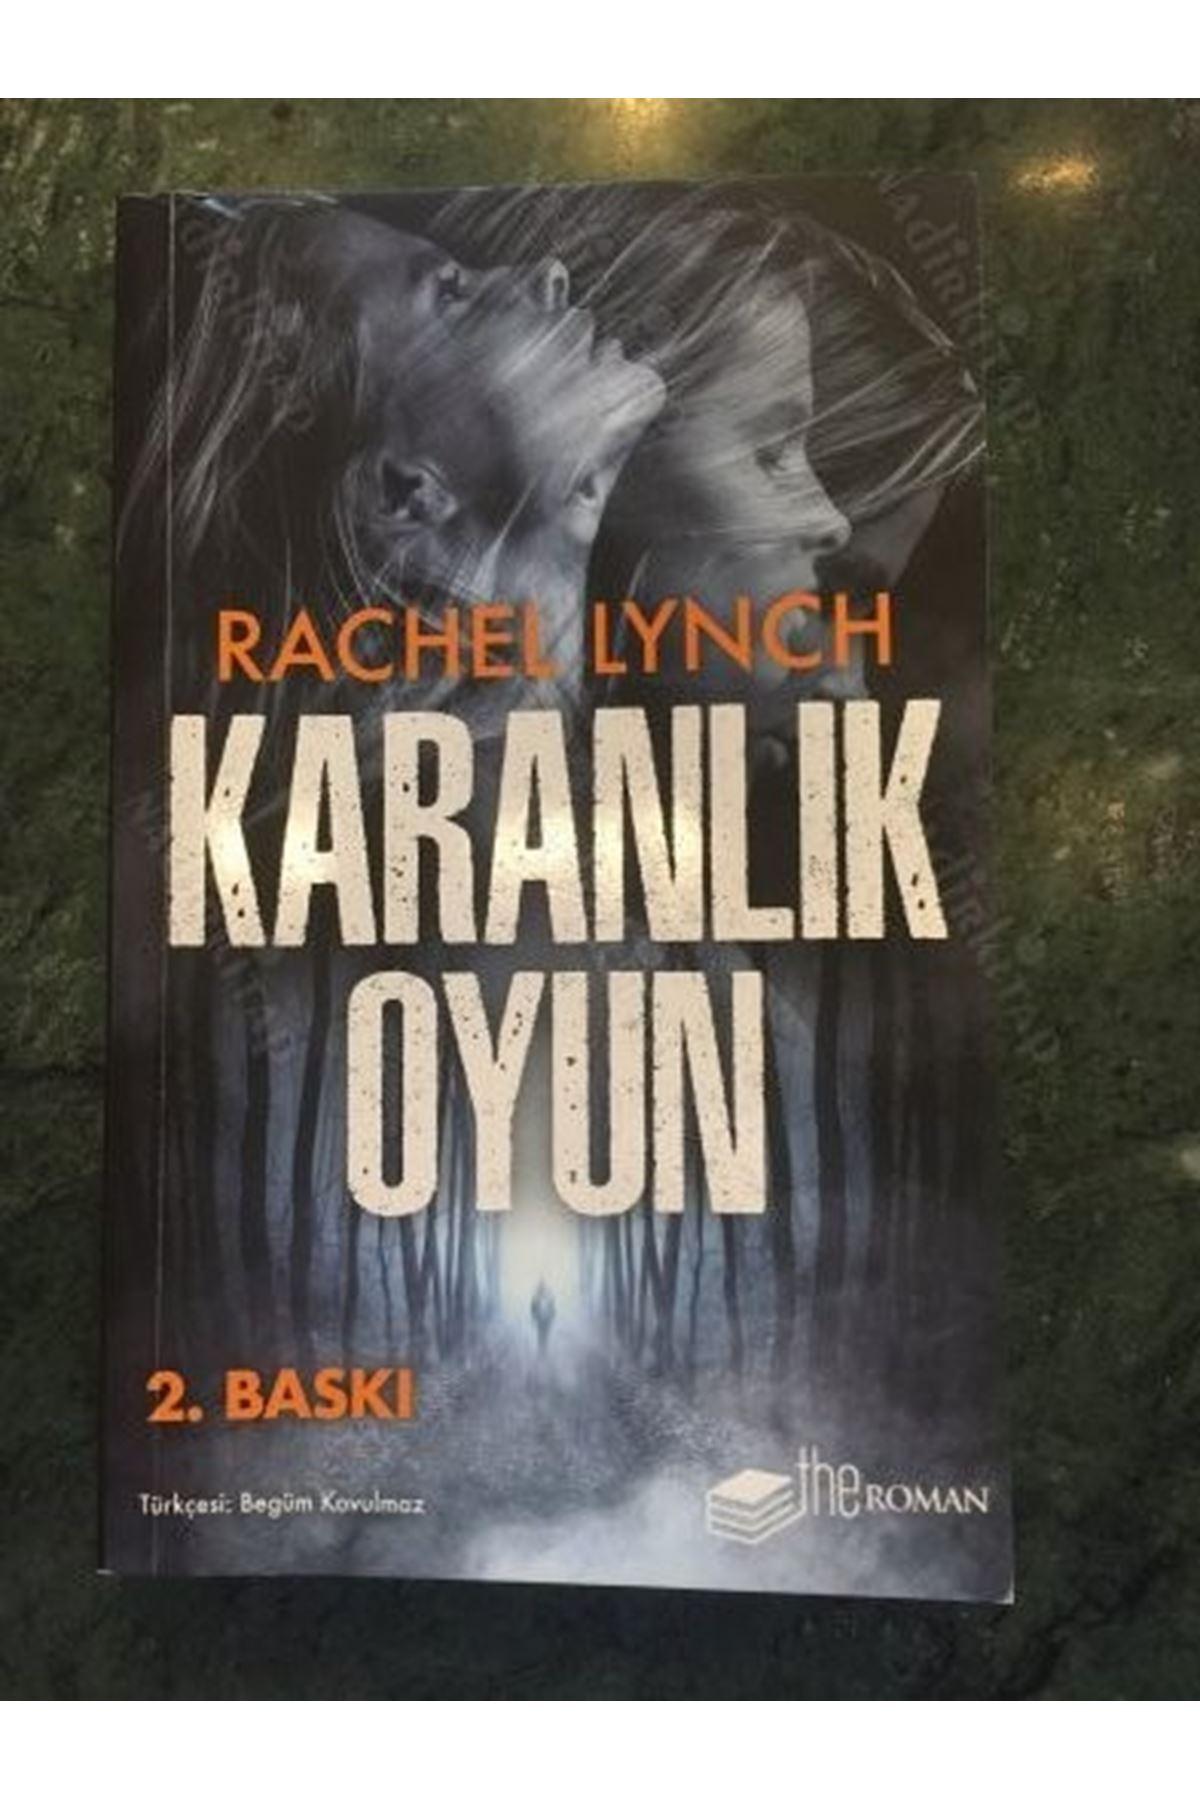 RACHEL LYNCH - KARANLIK OYUN